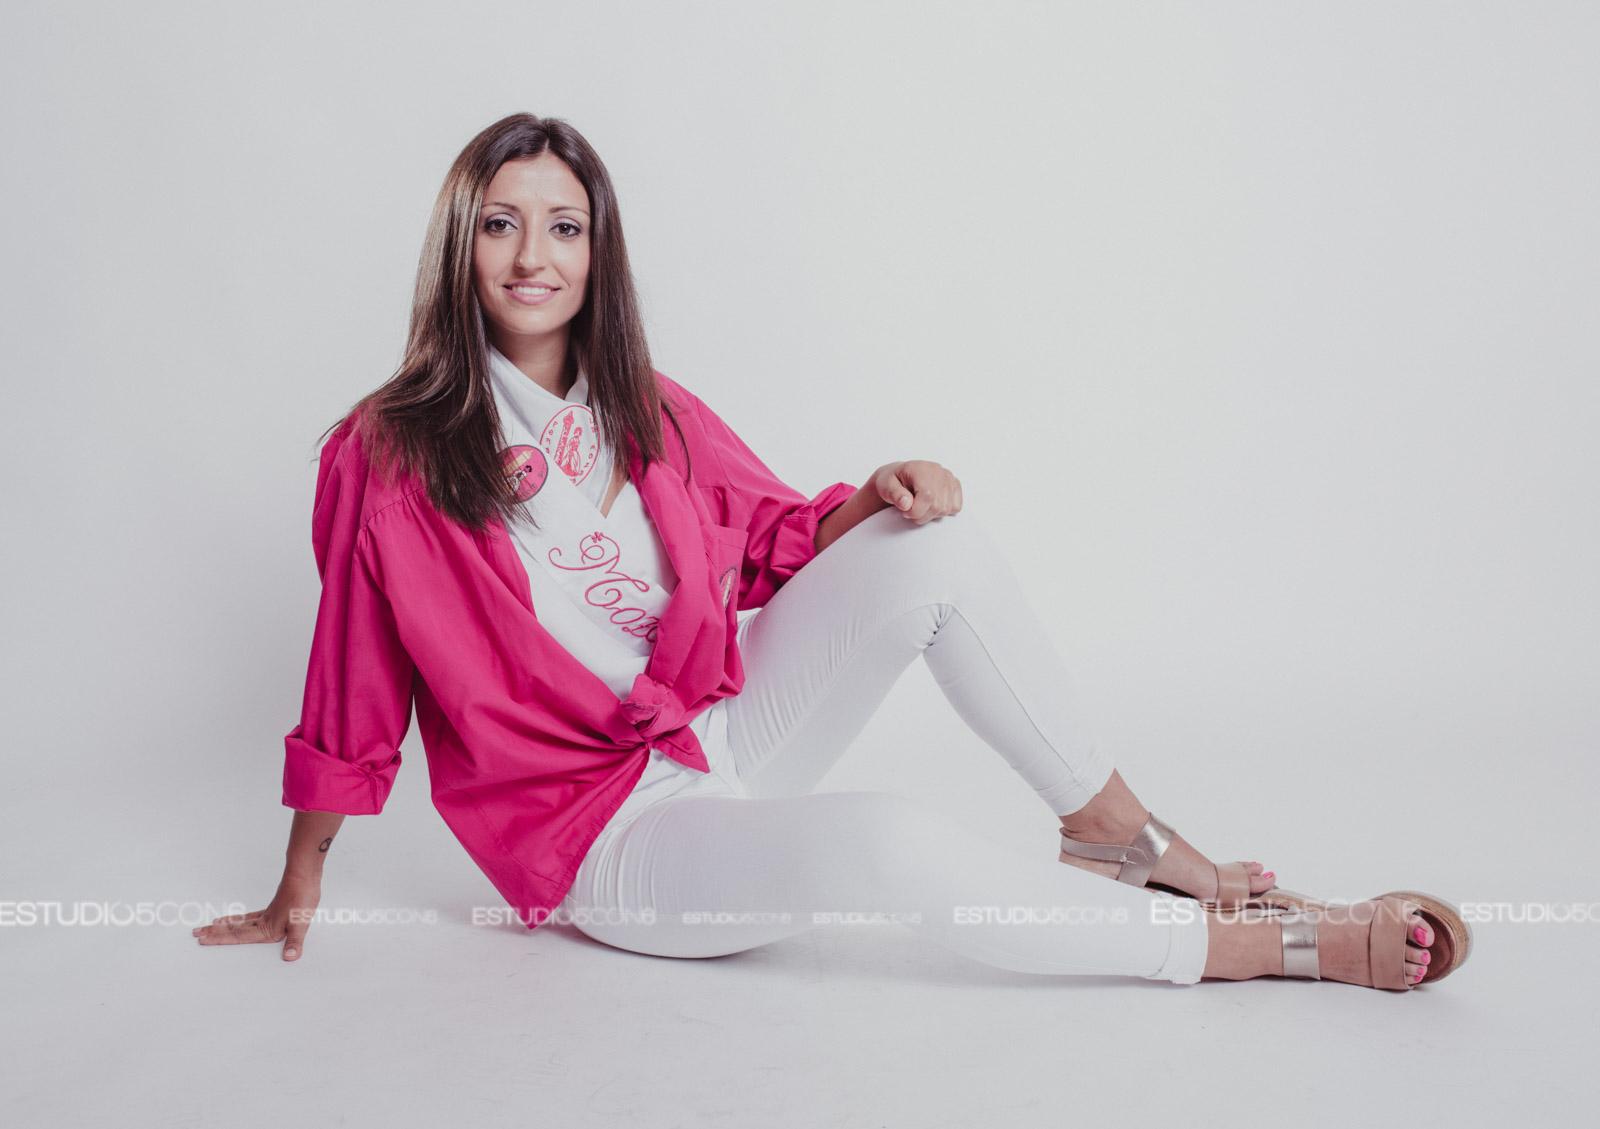 ANDREA, REINA PEÑA LA MOZA 2017-2018